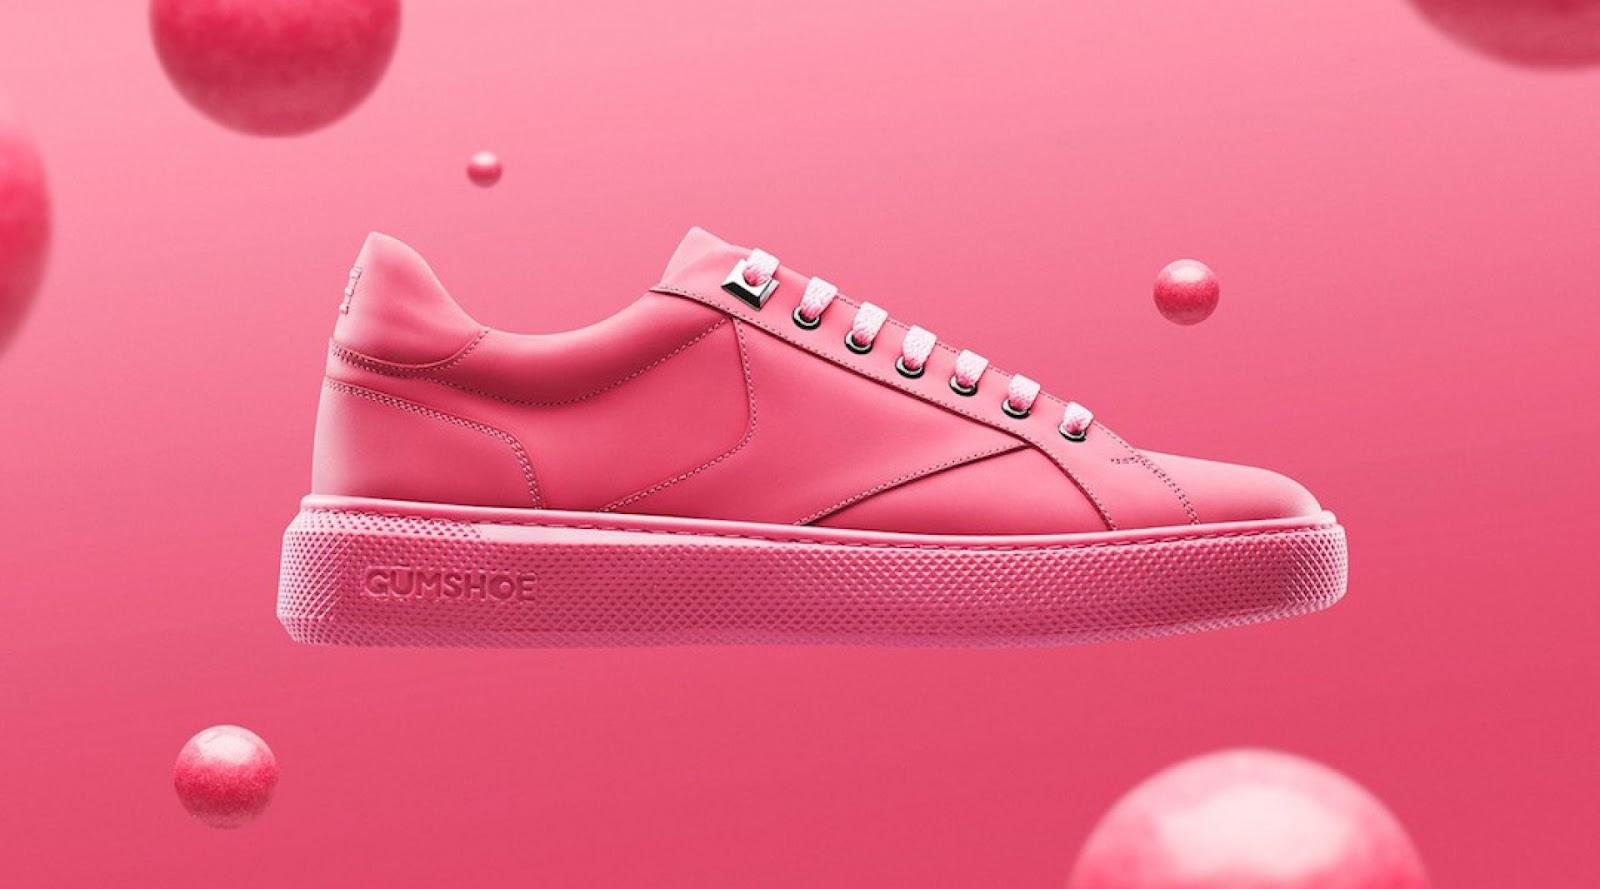 ae0b3fe3c0 Sneakers de chicle  - High on Fashion